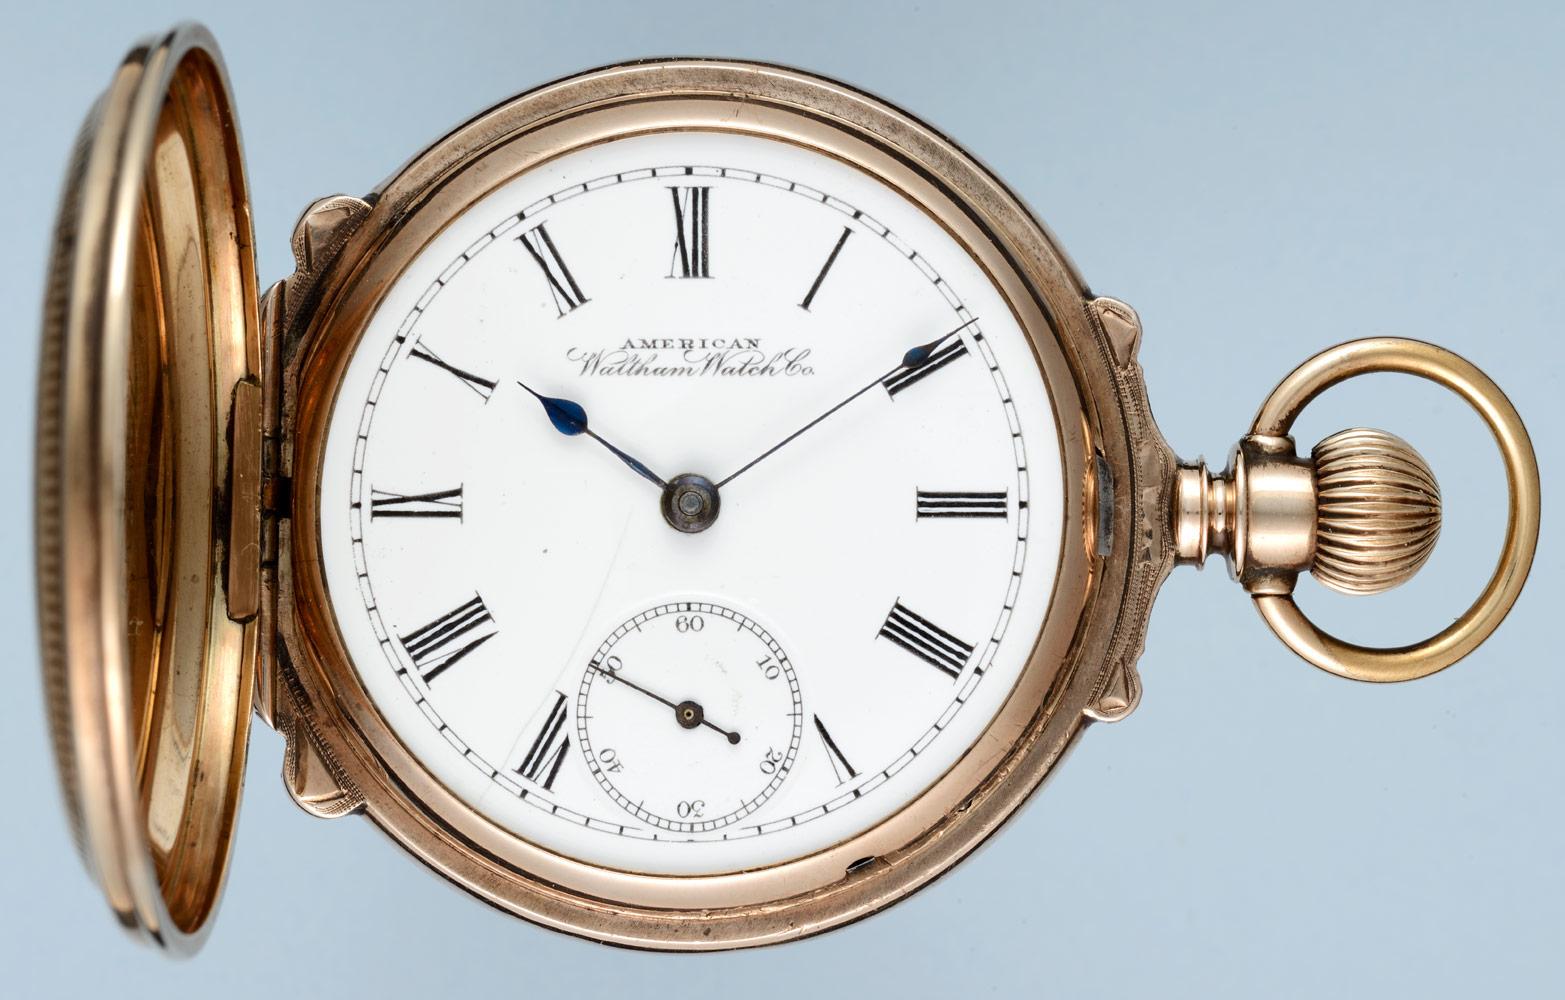 Image: antique-watch.com